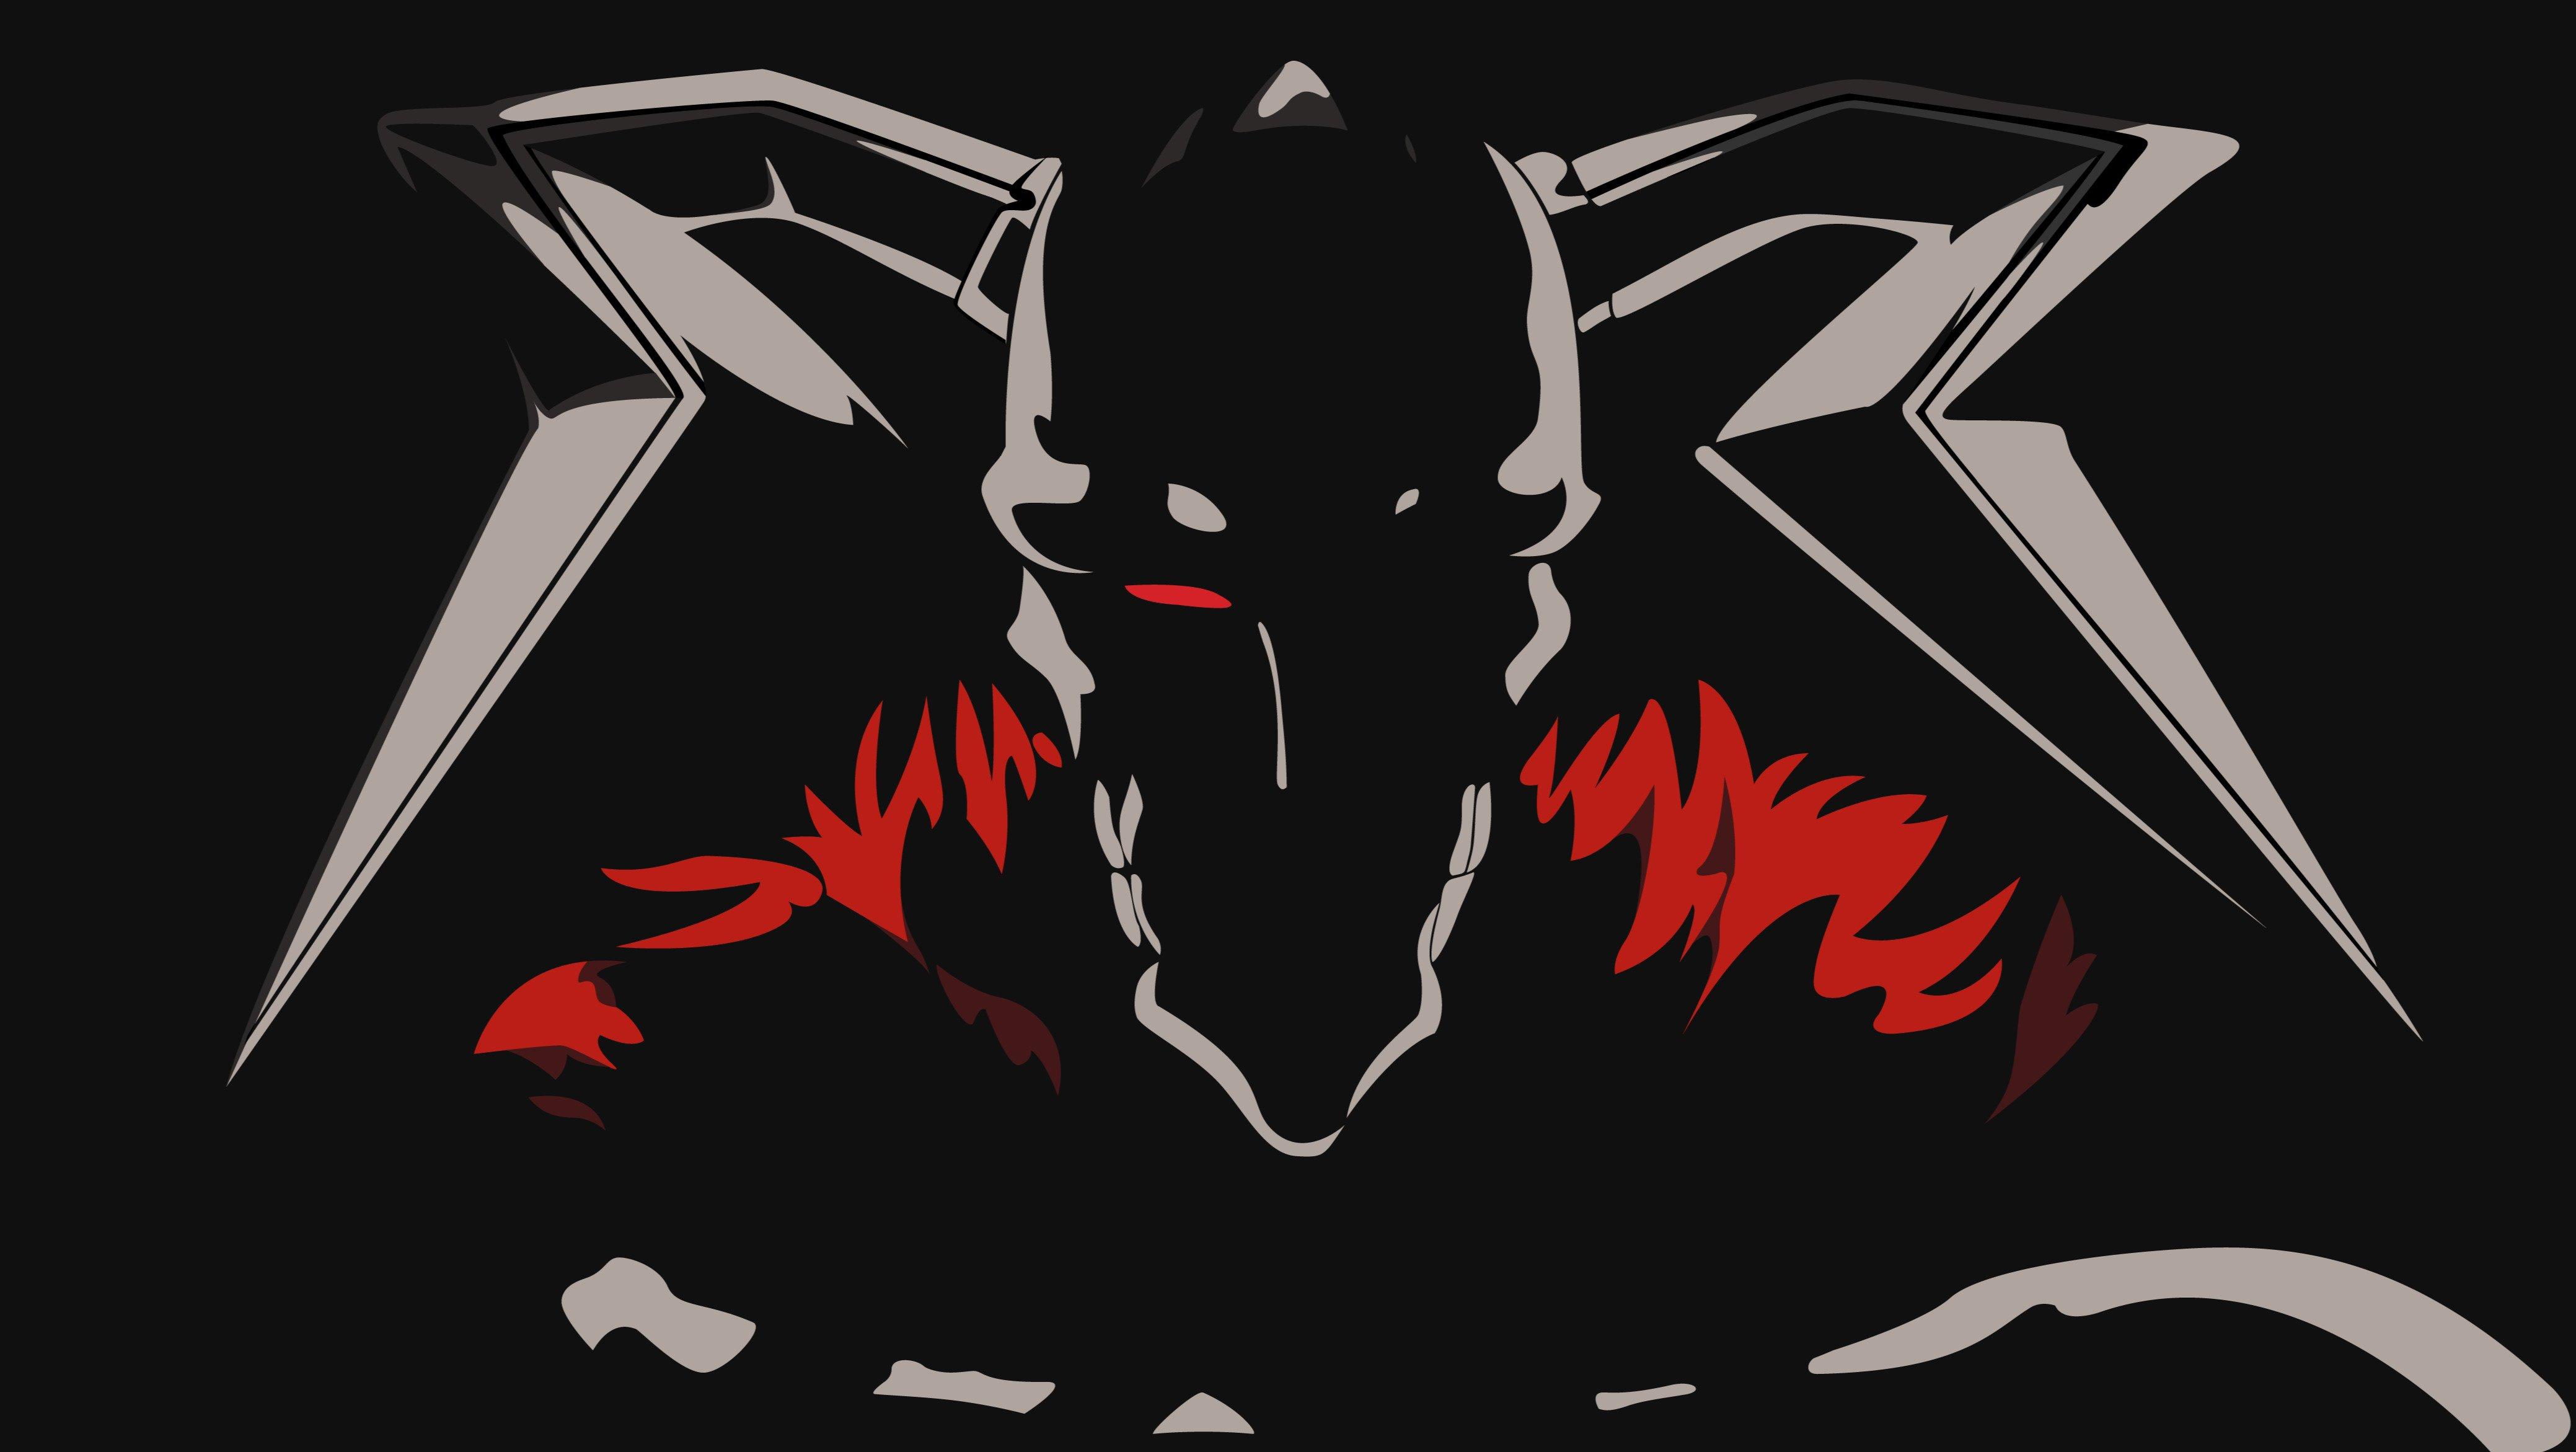 Bleach anime kurosaki ichigo anime vectors vasto lorde - Anime wallpaper black background ...